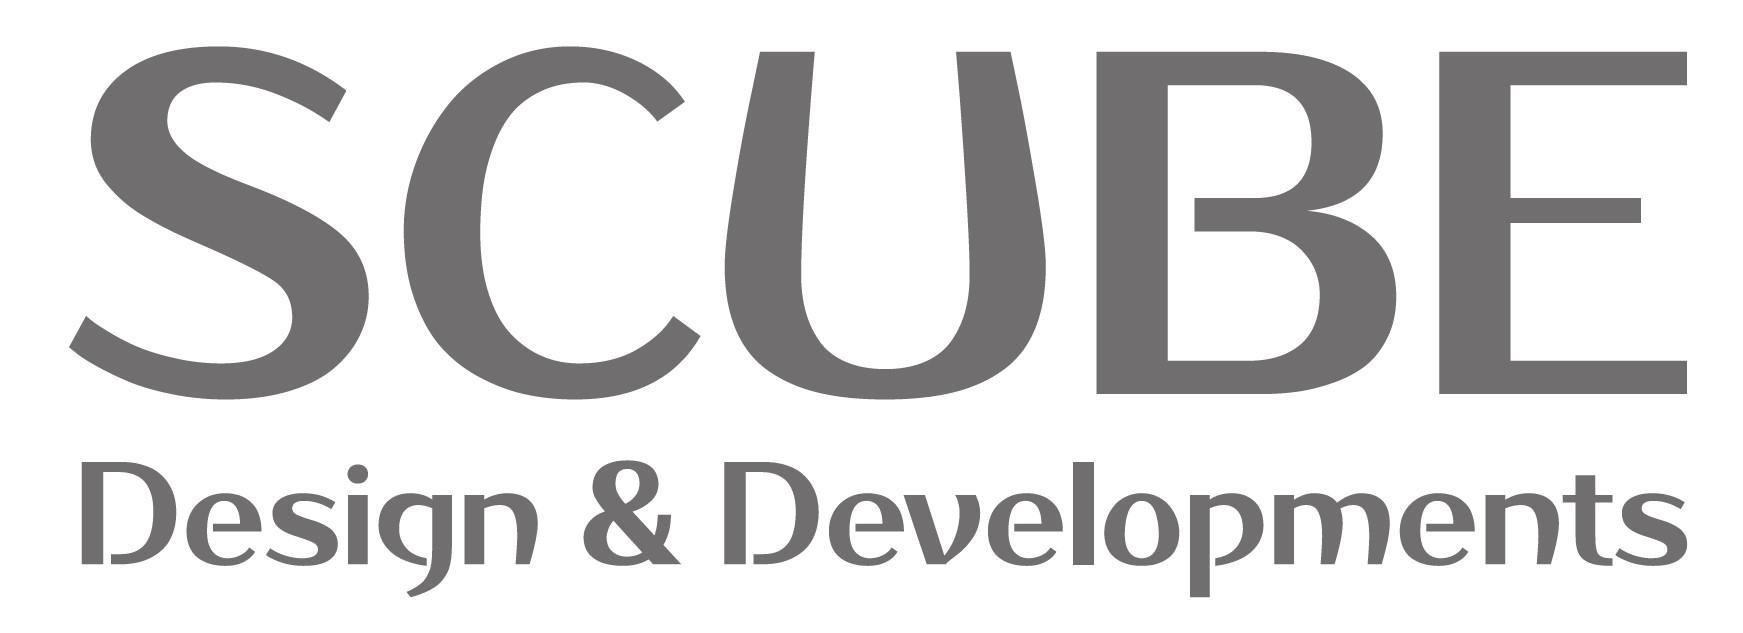 Scube Logo